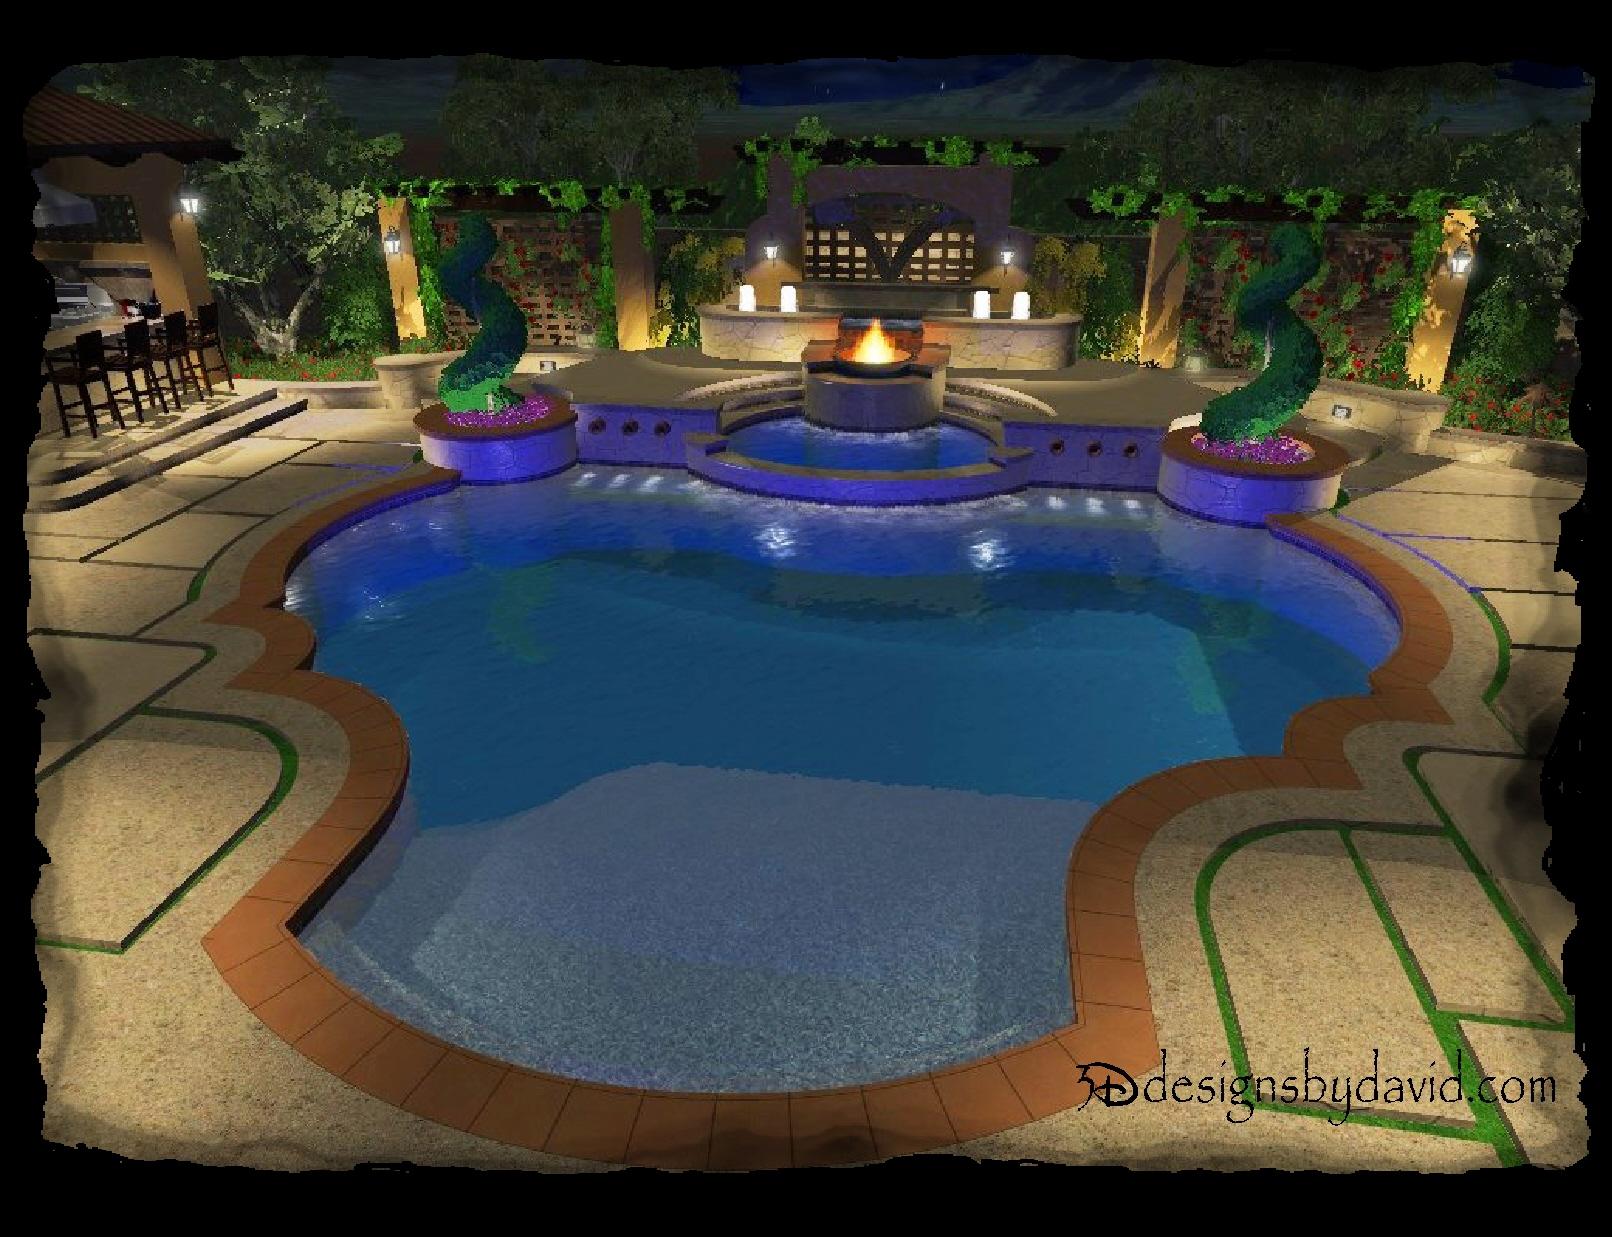 Liquid designs 3d designs by david for Virtual swimming pool design